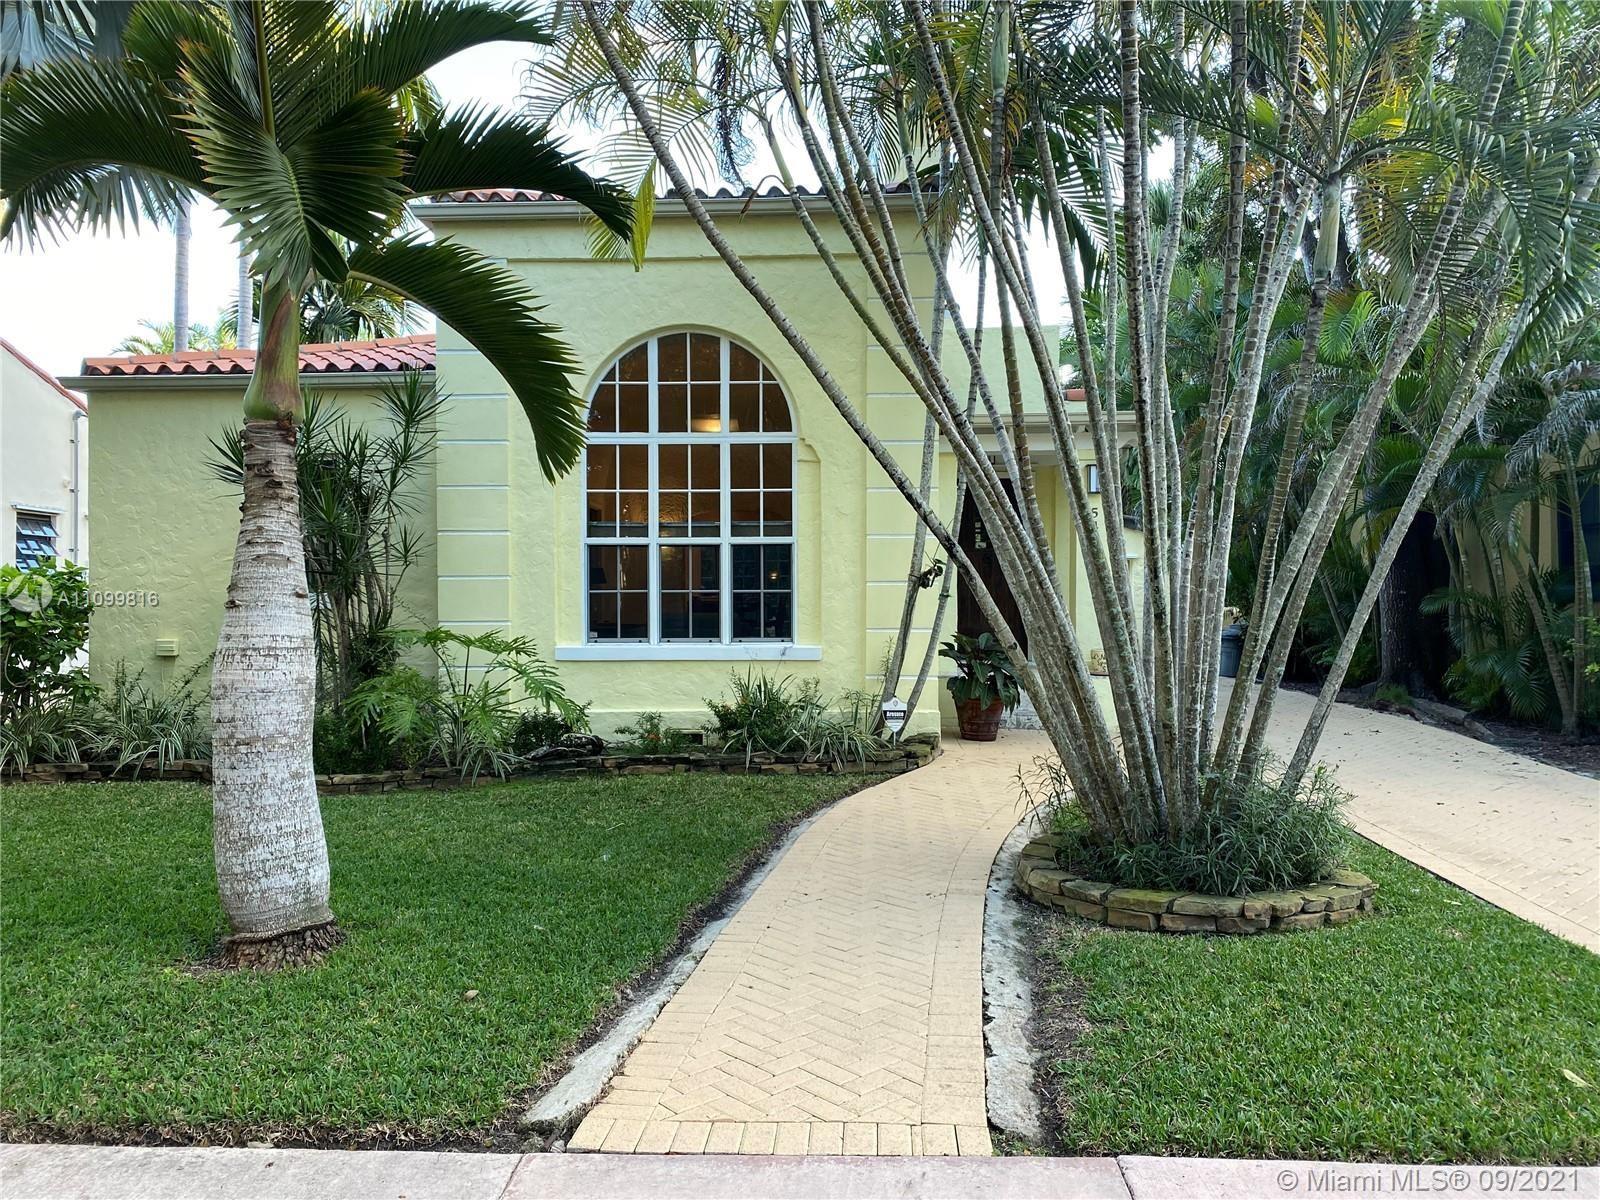 Photo of 544 San Lorenzo Ave, Coral Gables, FL 33146 (MLS # A11099816)